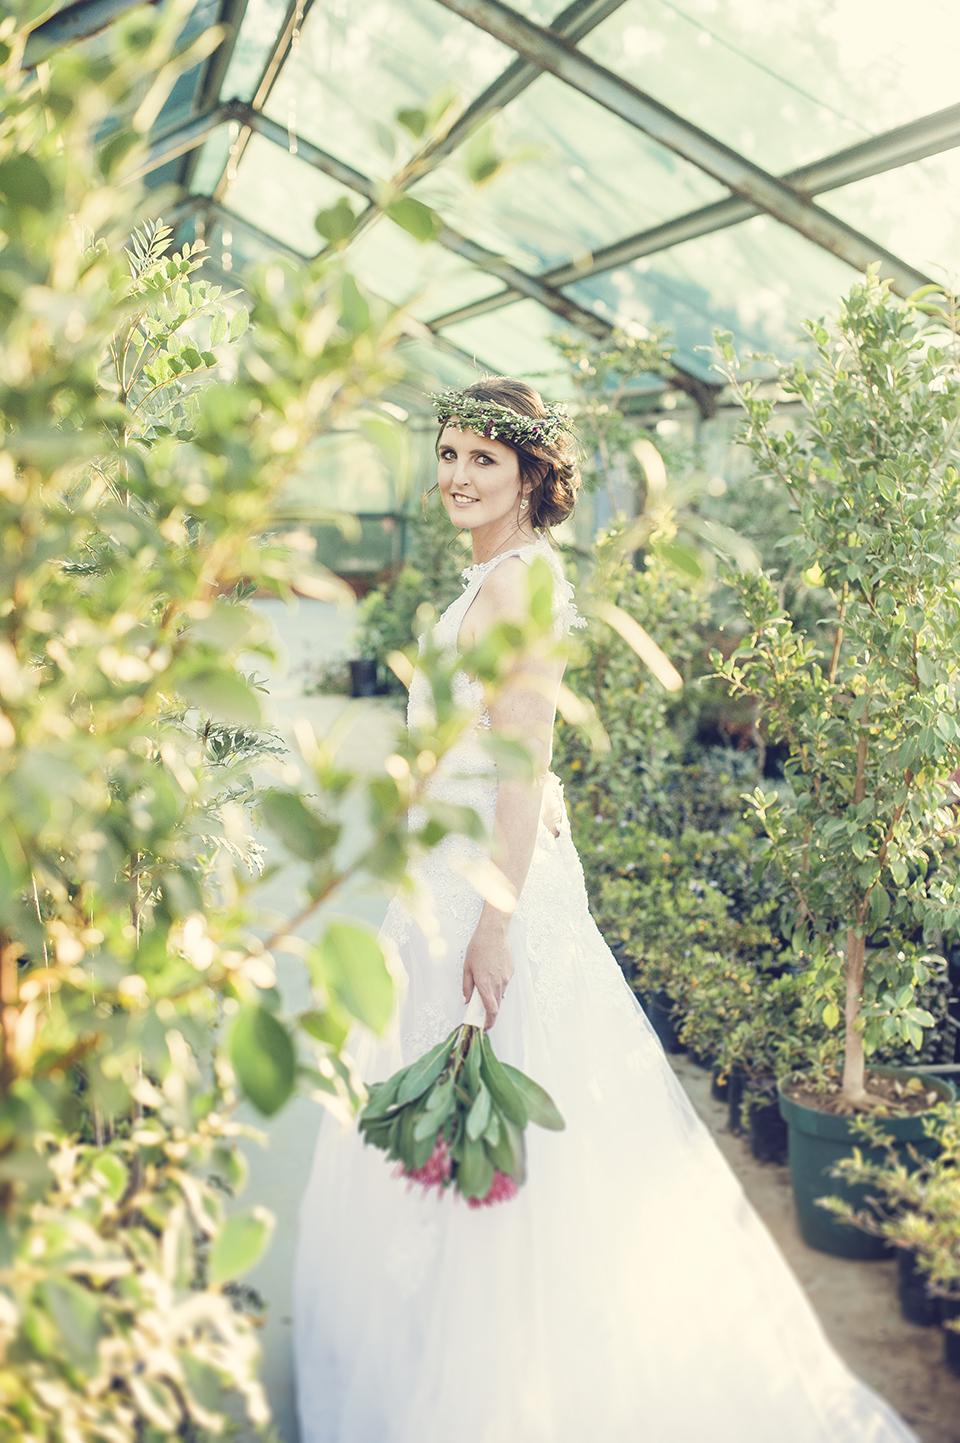 RyanParker_WeddingPhotographer_Pretoria_RosemaryHill_Gauteng_P&R_DSC_6905.jpg